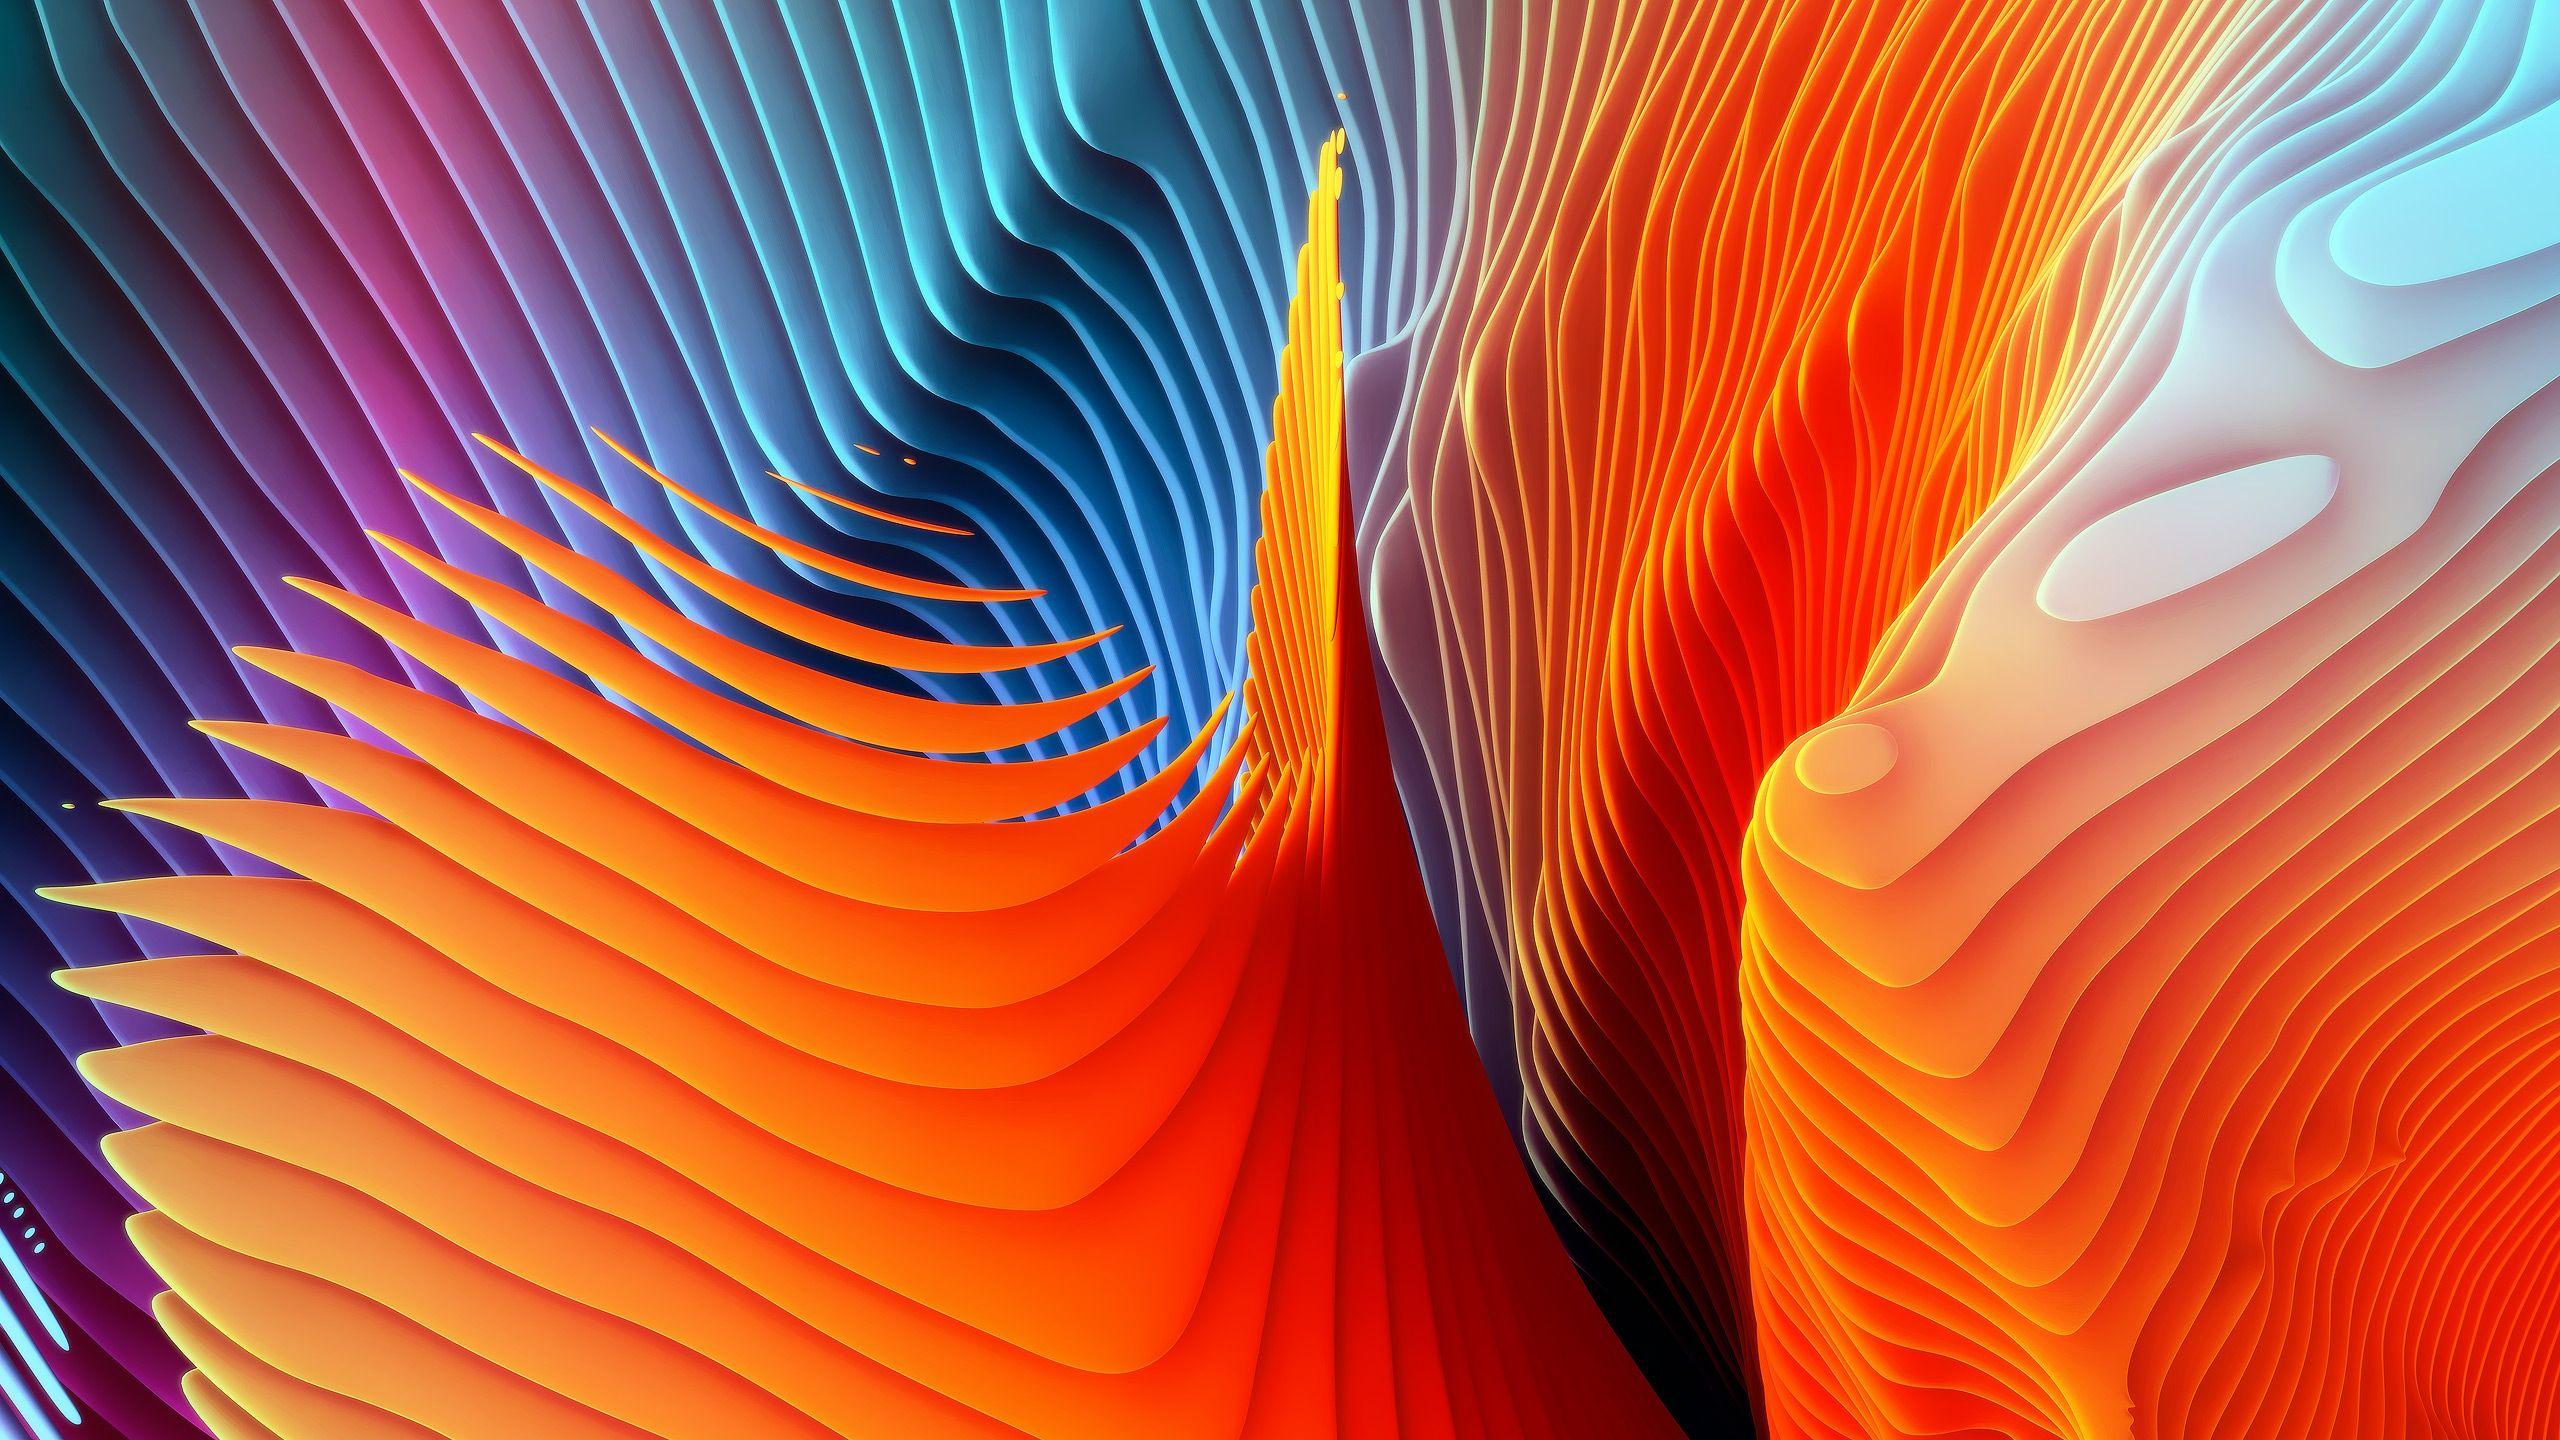 wallpaper for macbook pro retina